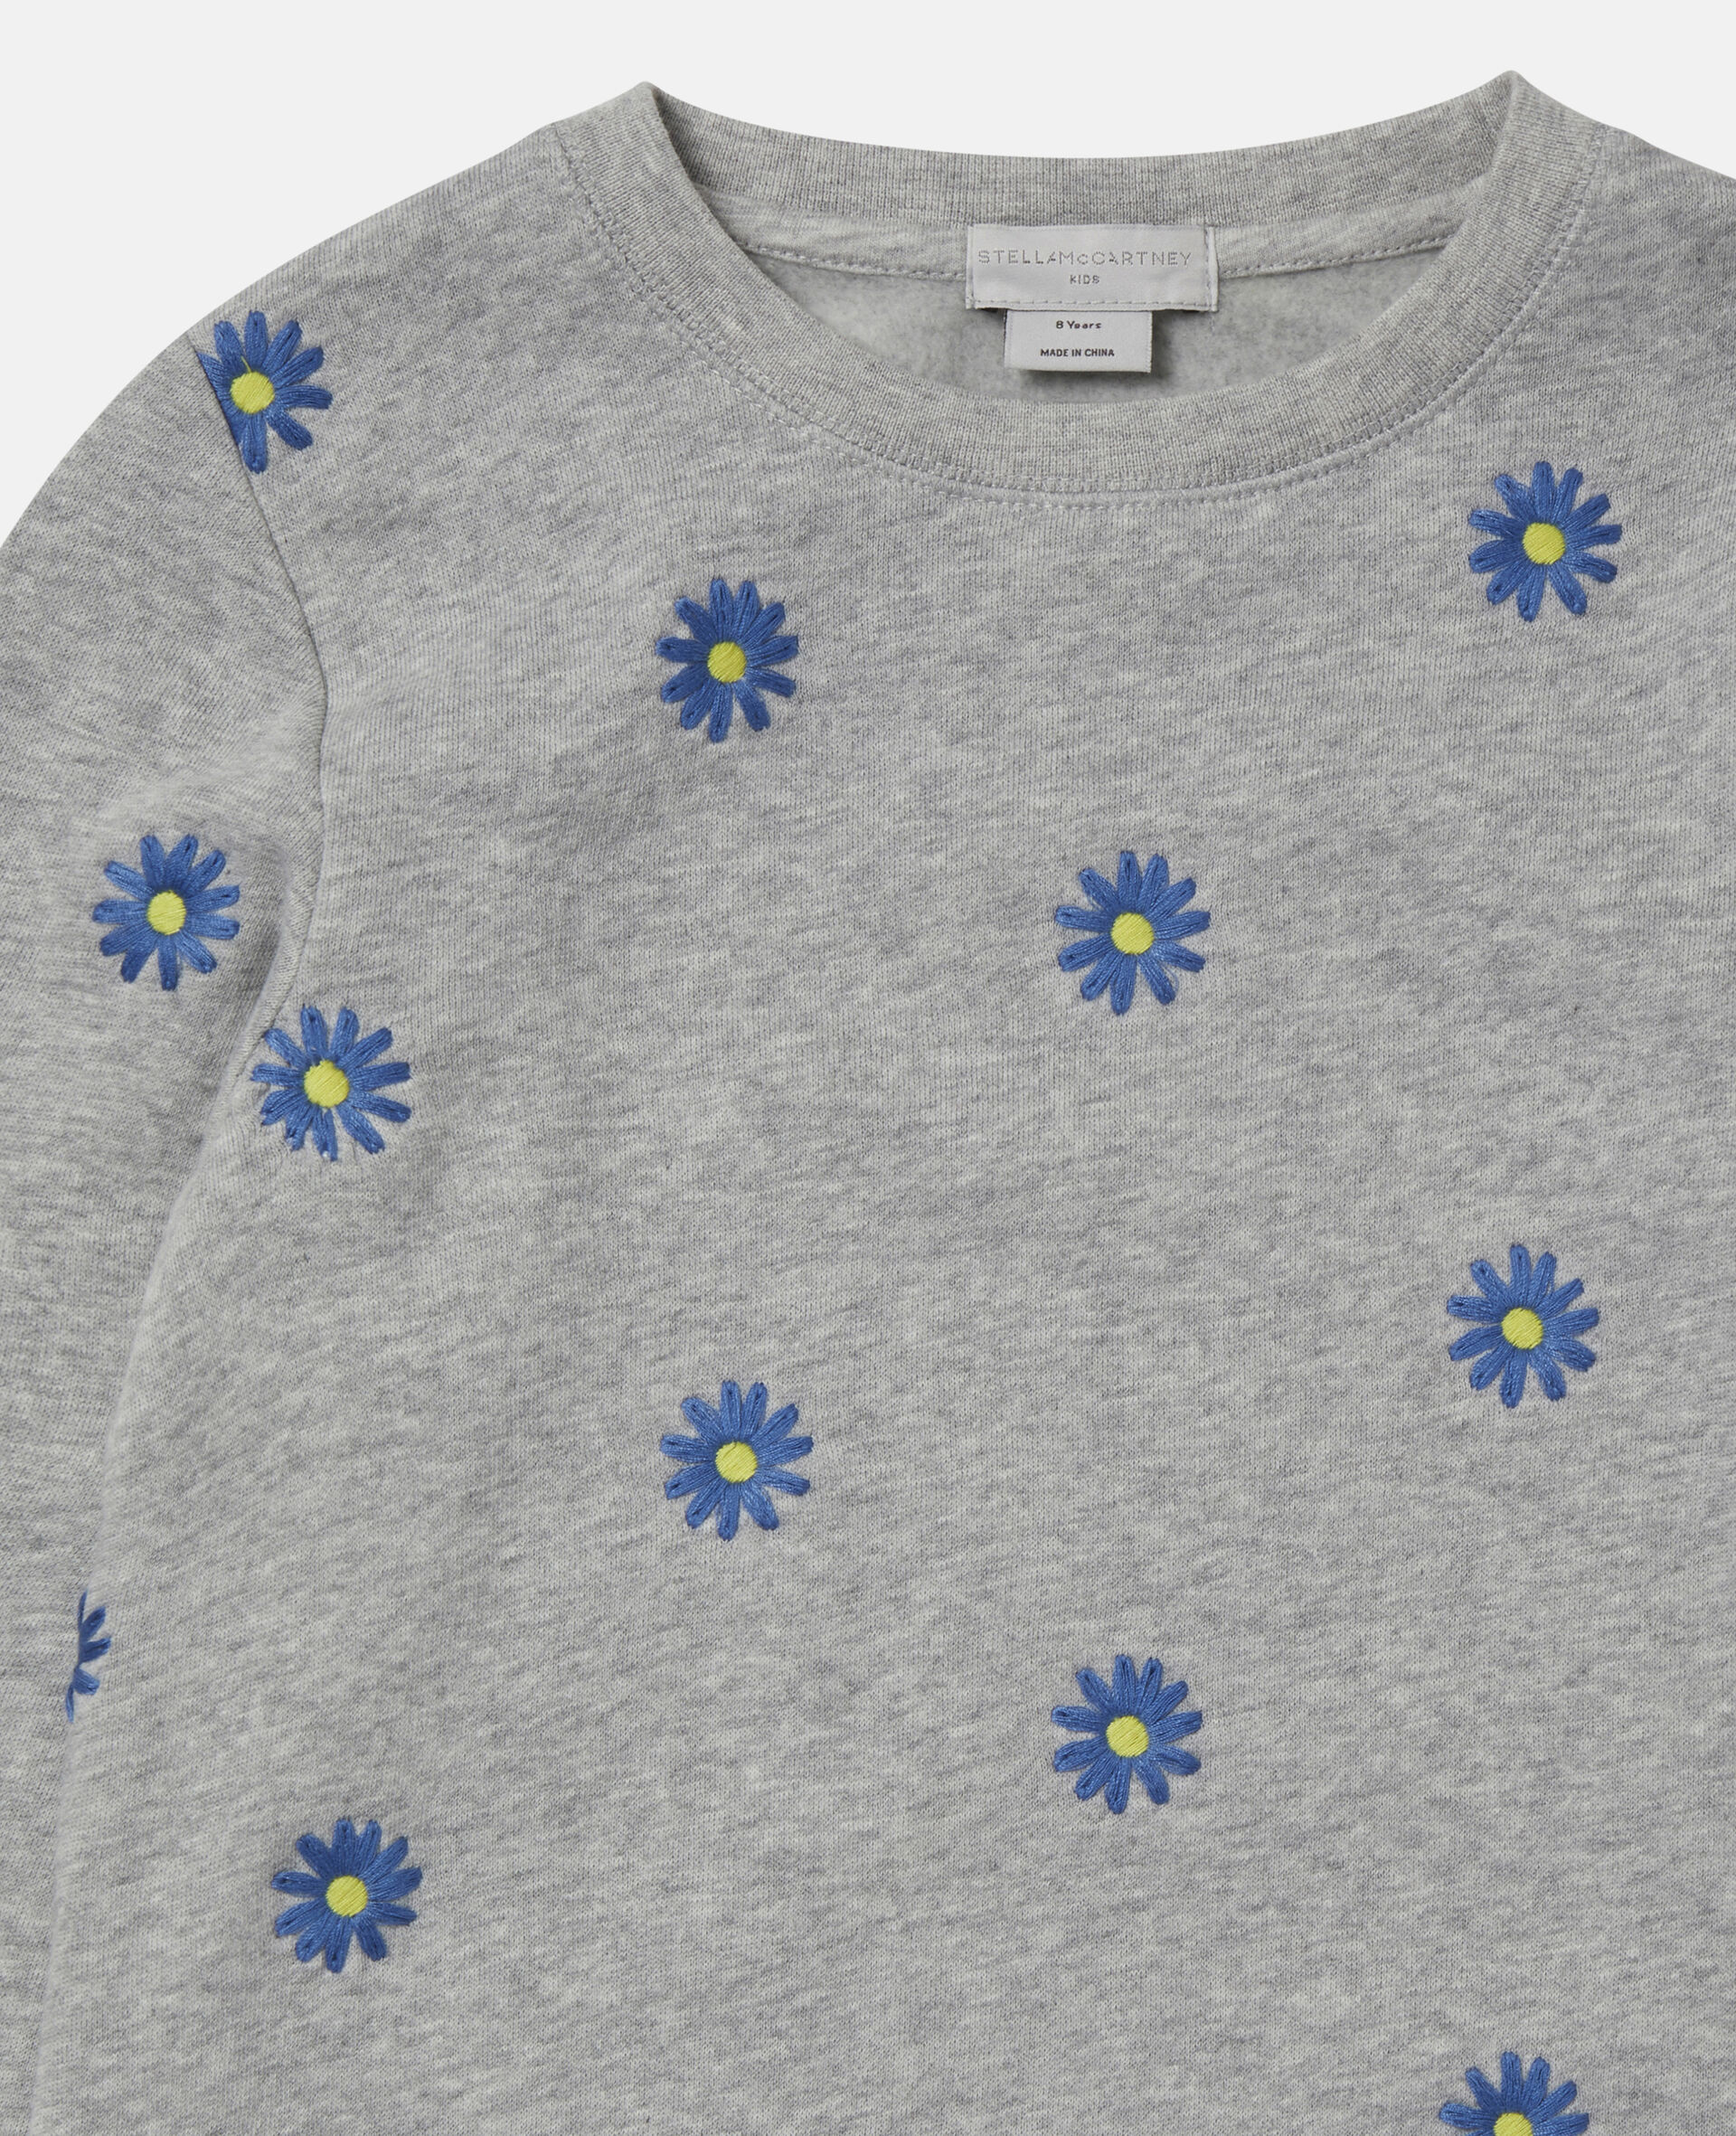 Embroidered Daisies Cotton Fleece Sweatshirt -Grey-large image number 1